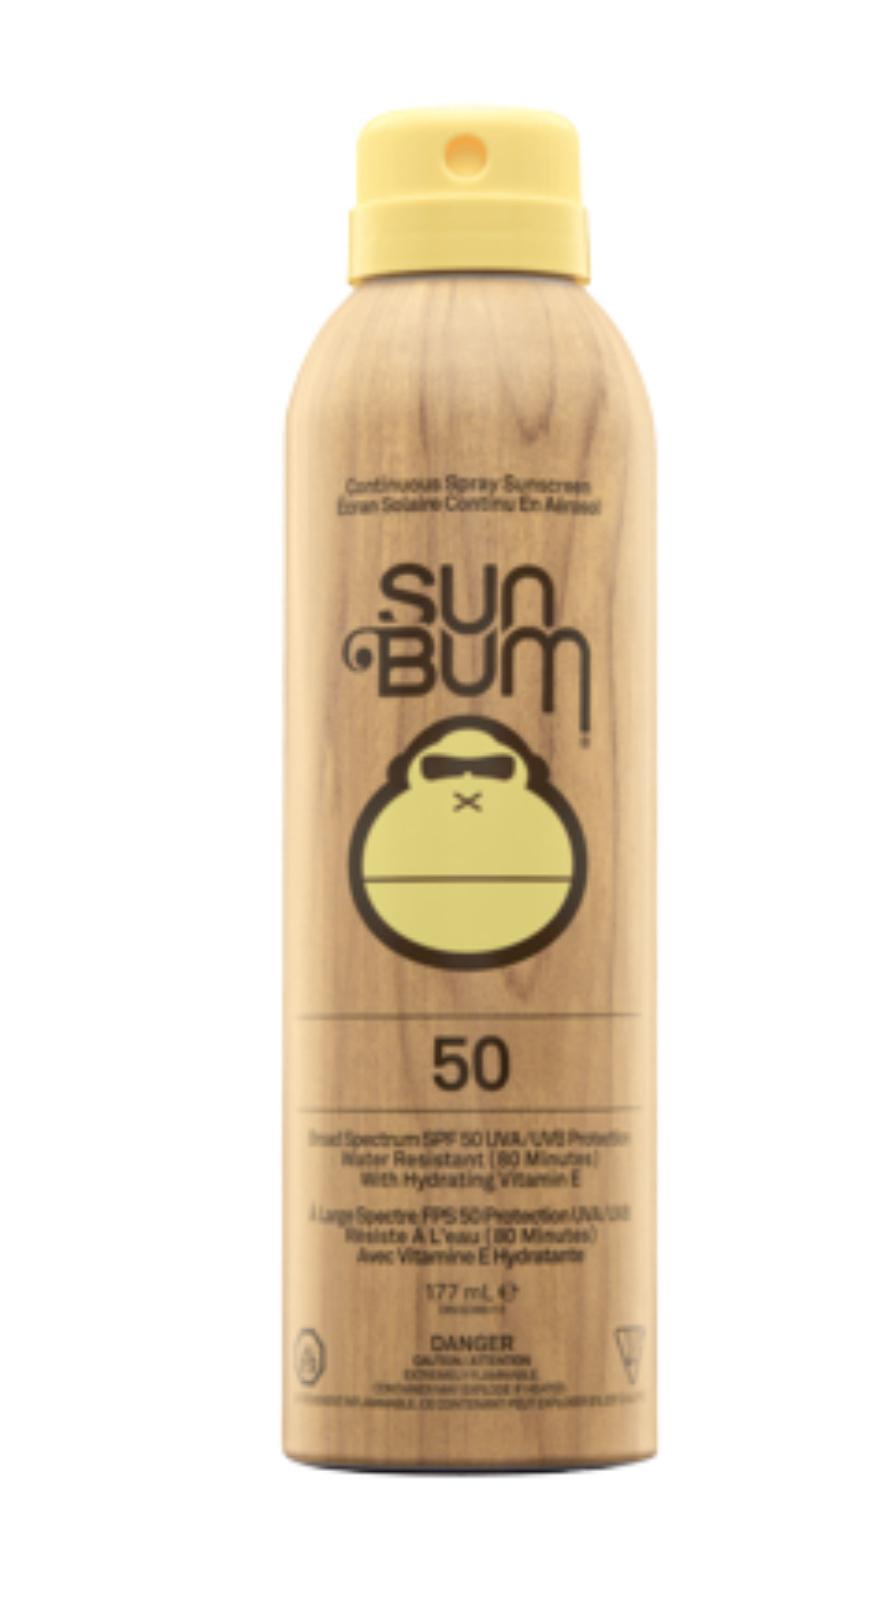 Sun Bum Sun Bum Original SPF 50 Suncreen Spray